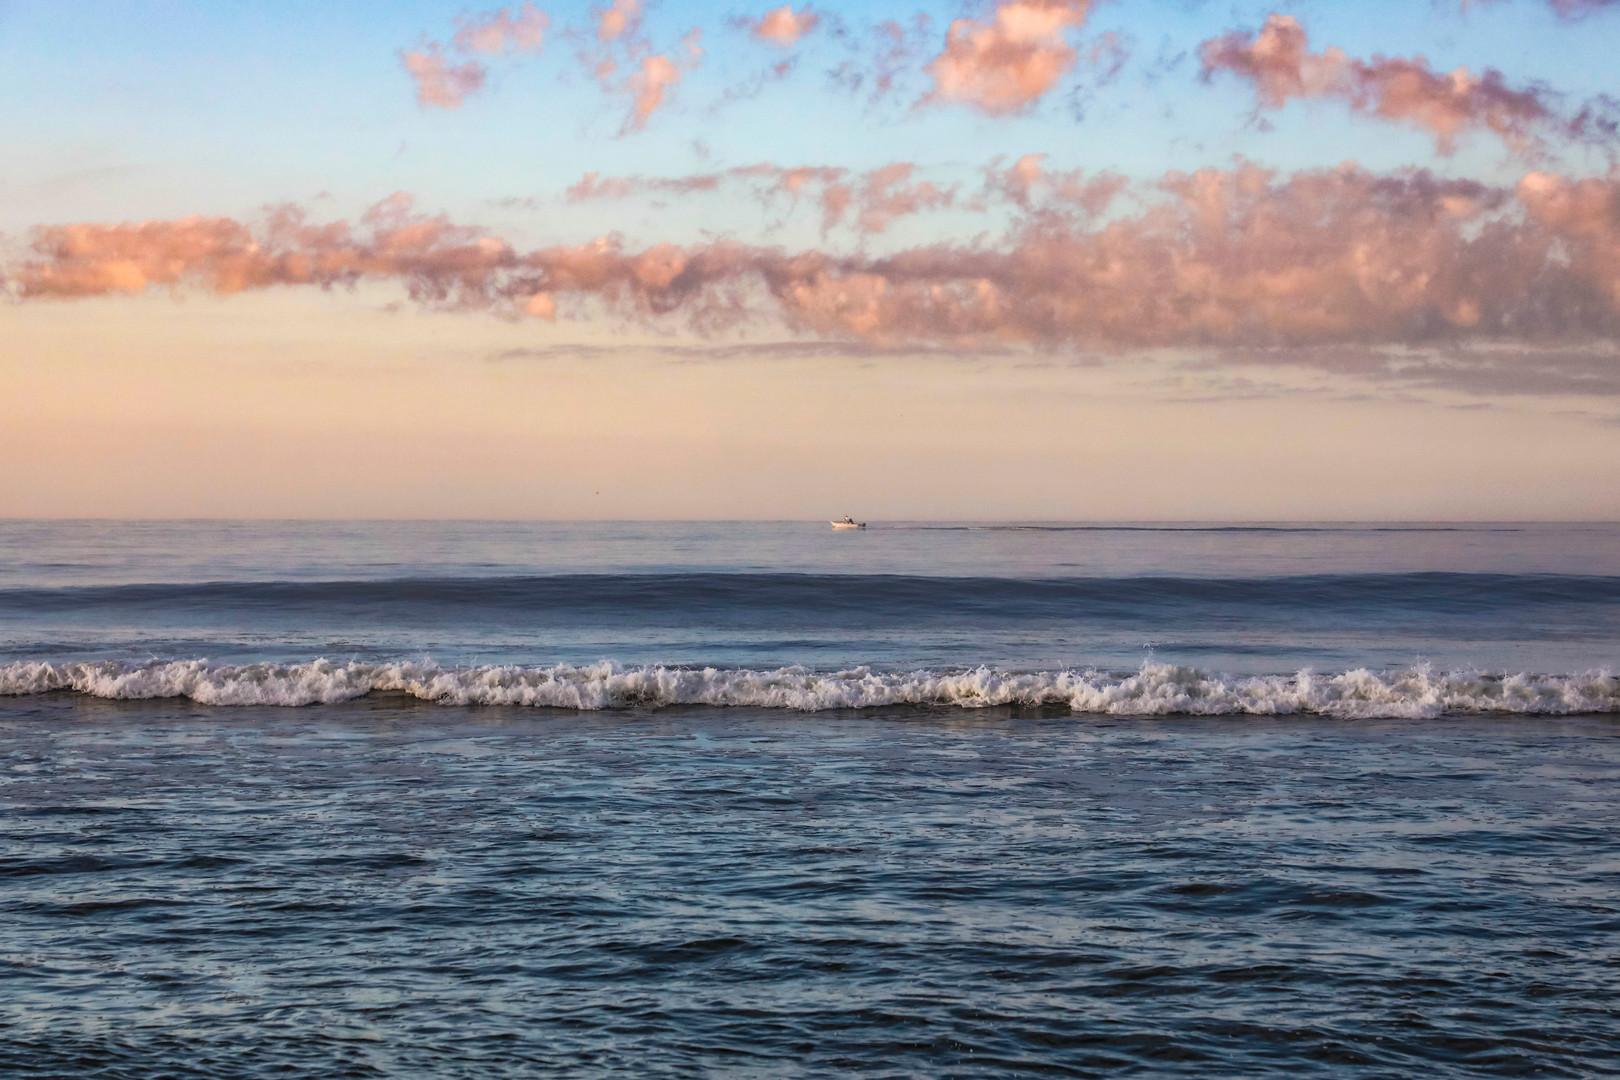 Fishing Boat in a Pastel Sky